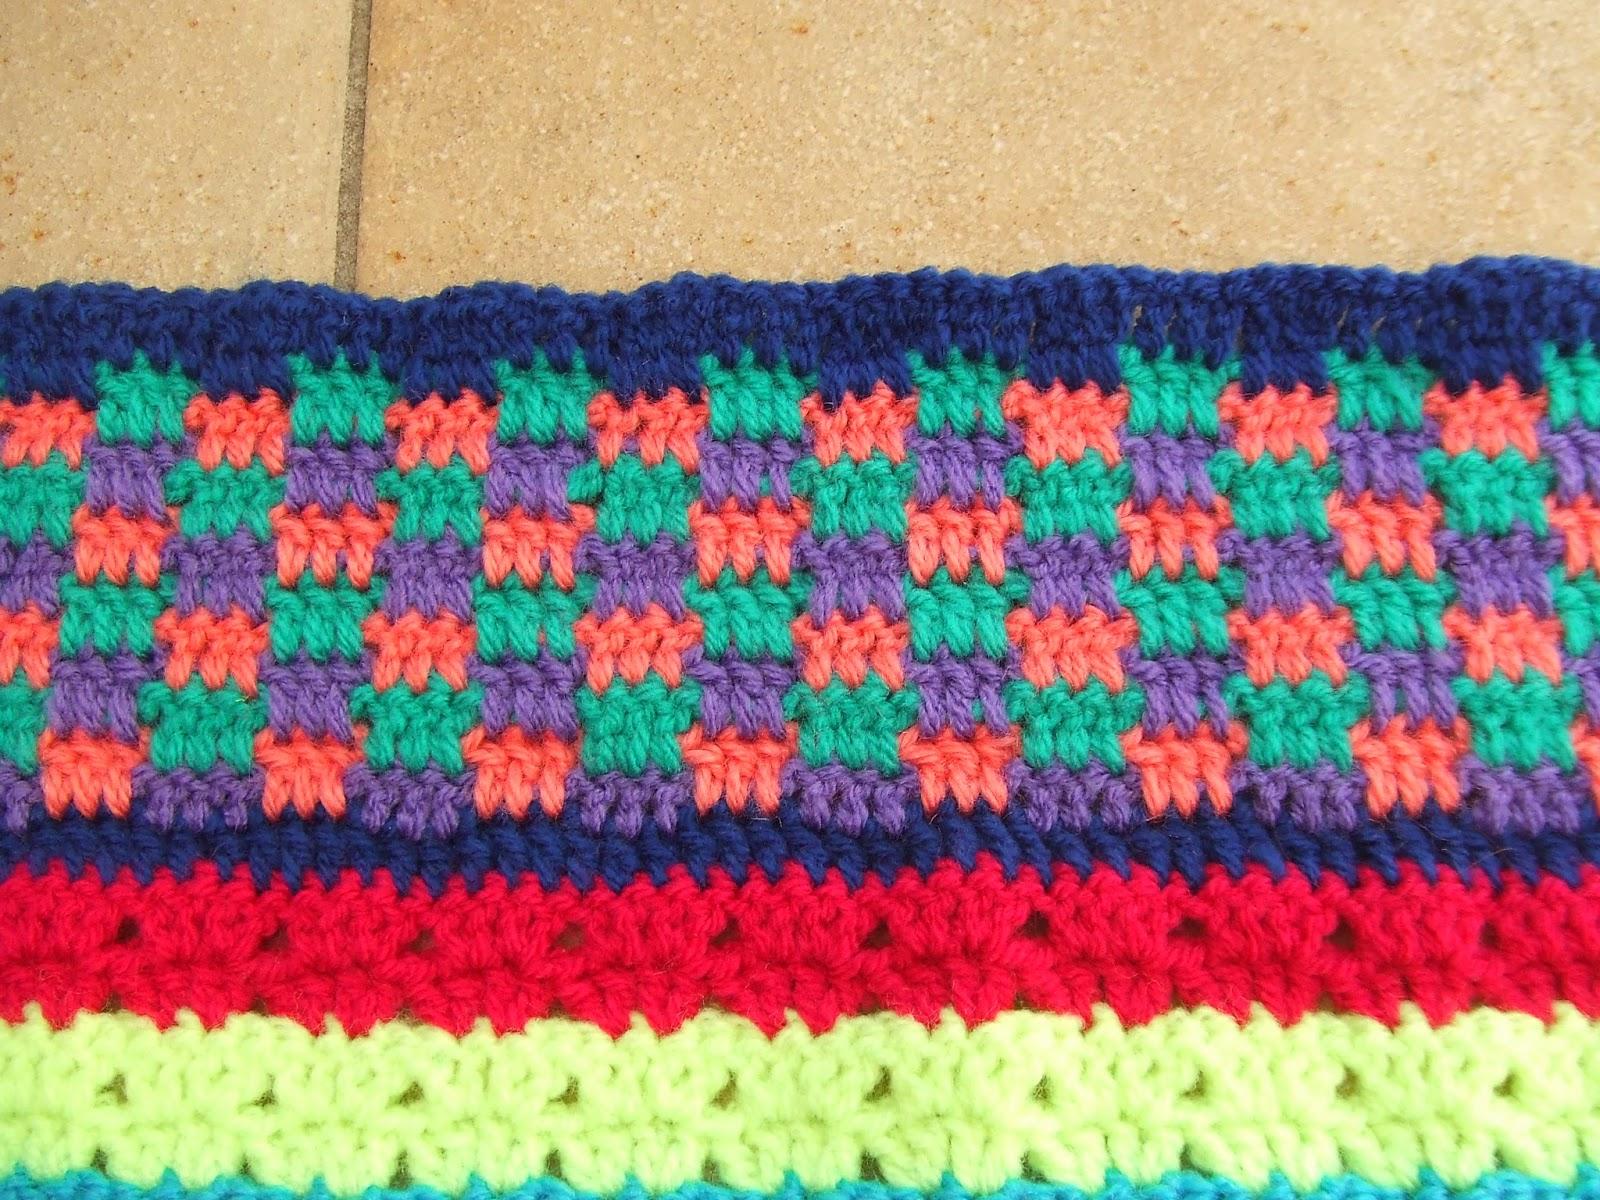 my world of crochet di tdecke woche 7 teil 6. Black Bedroom Furniture Sets. Home Design Ideas